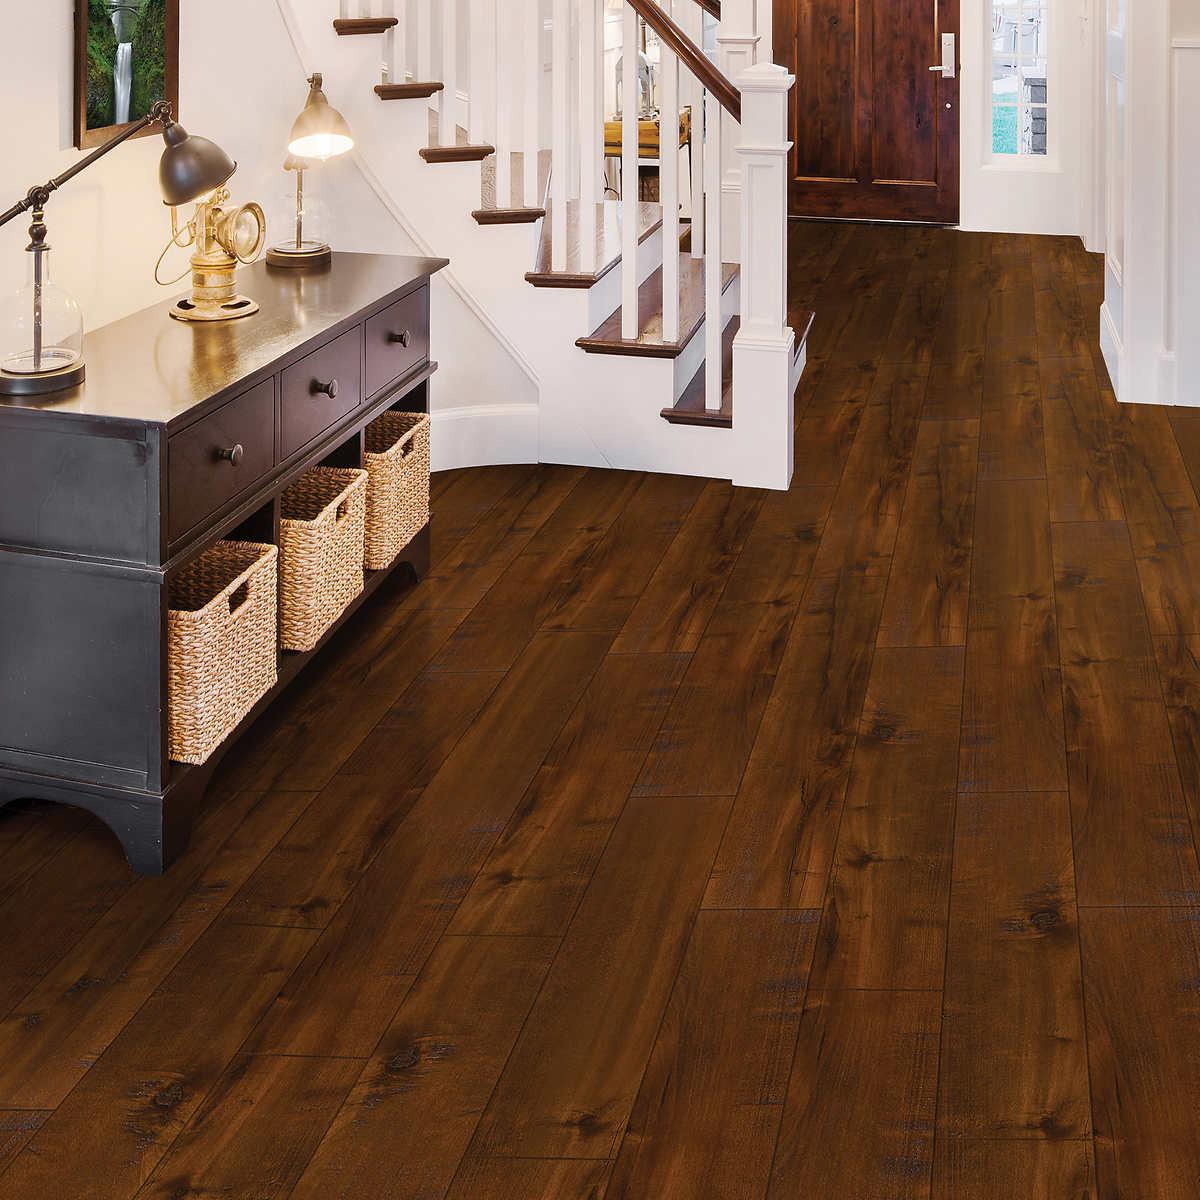 Giá sàn gỗ Quickstep